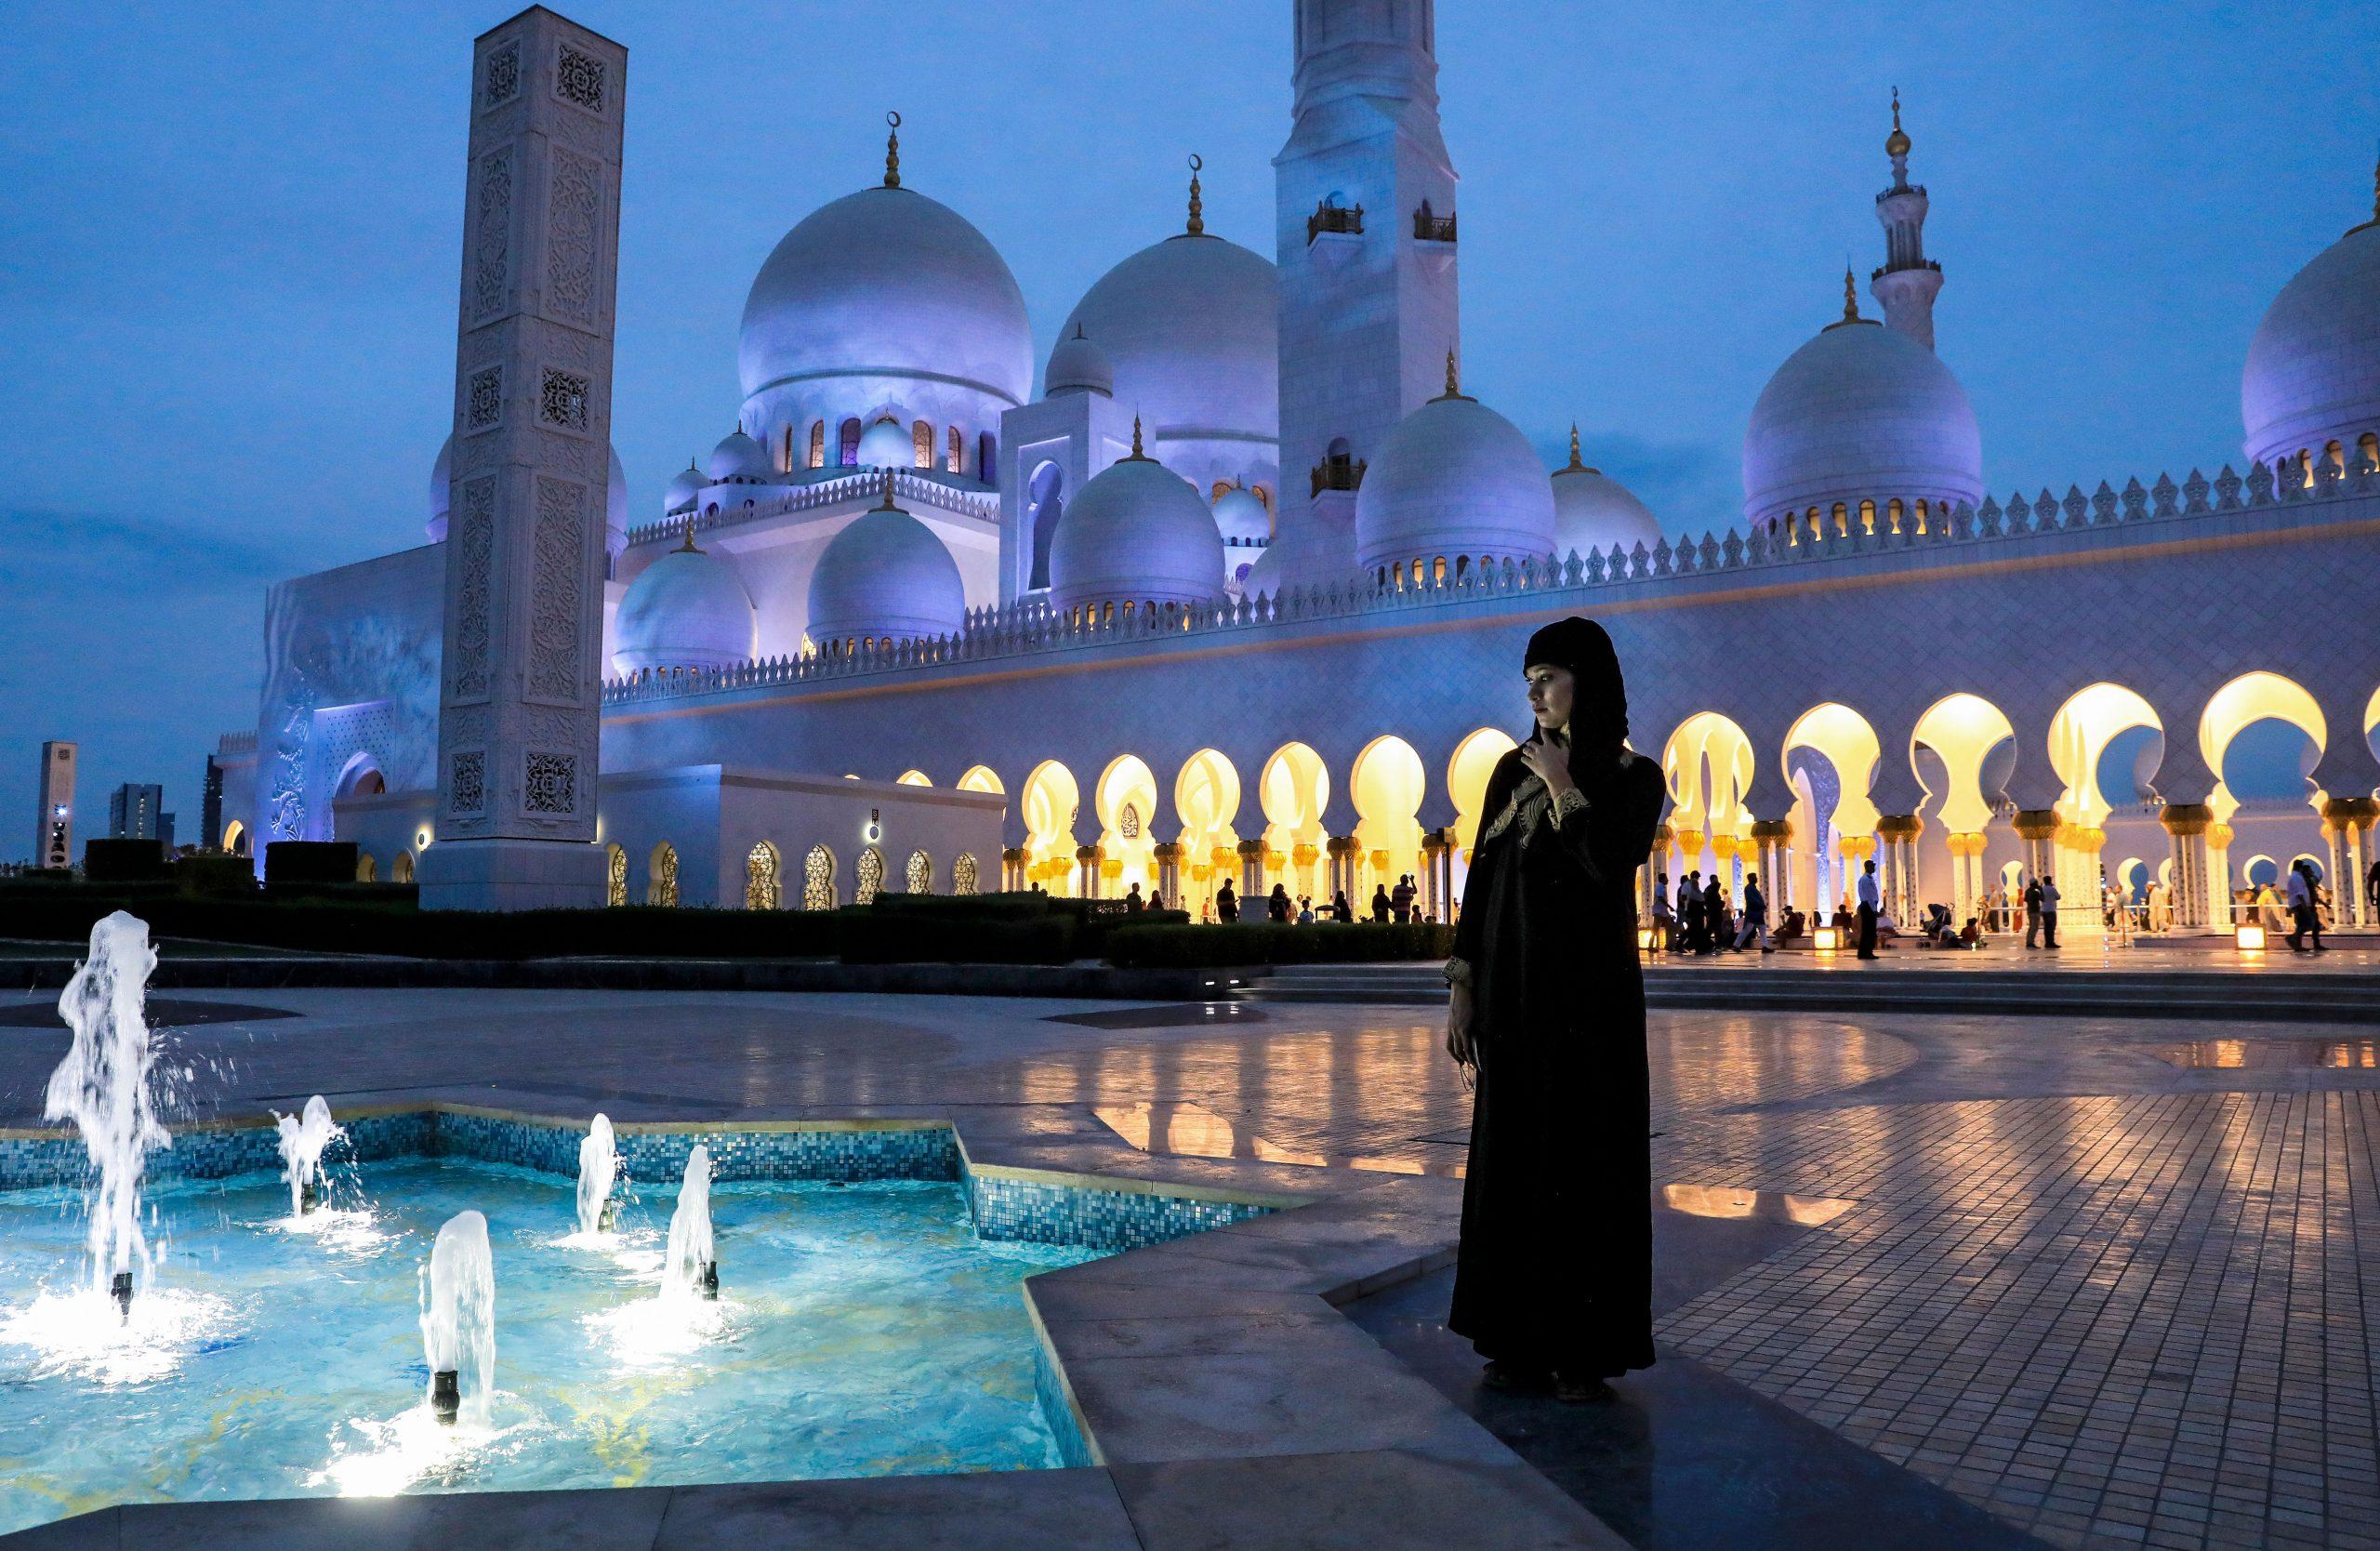 Sheikh Zayad Grand Mosque